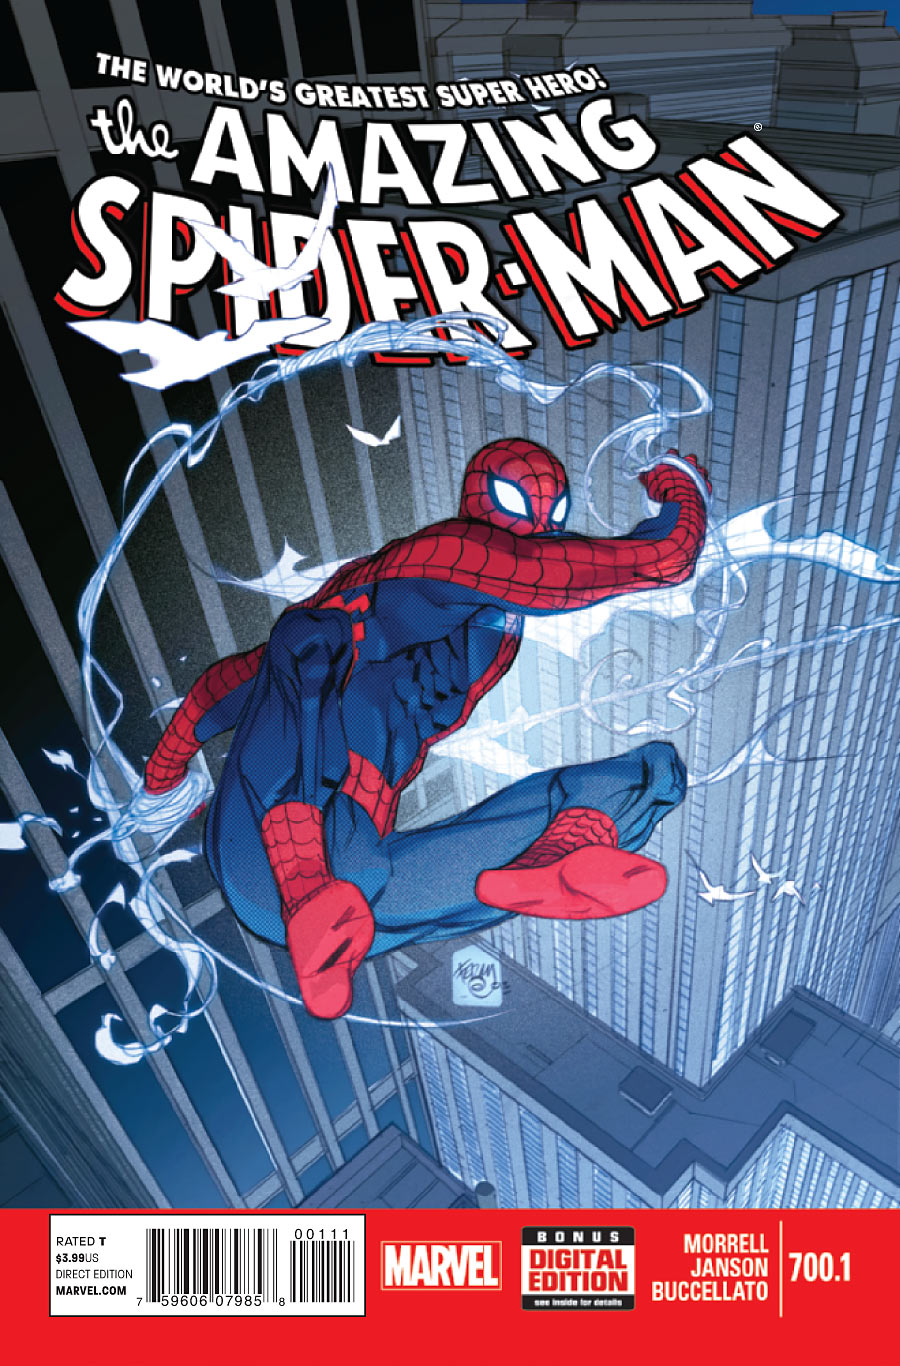 The Amazing Spider-Man #700.1